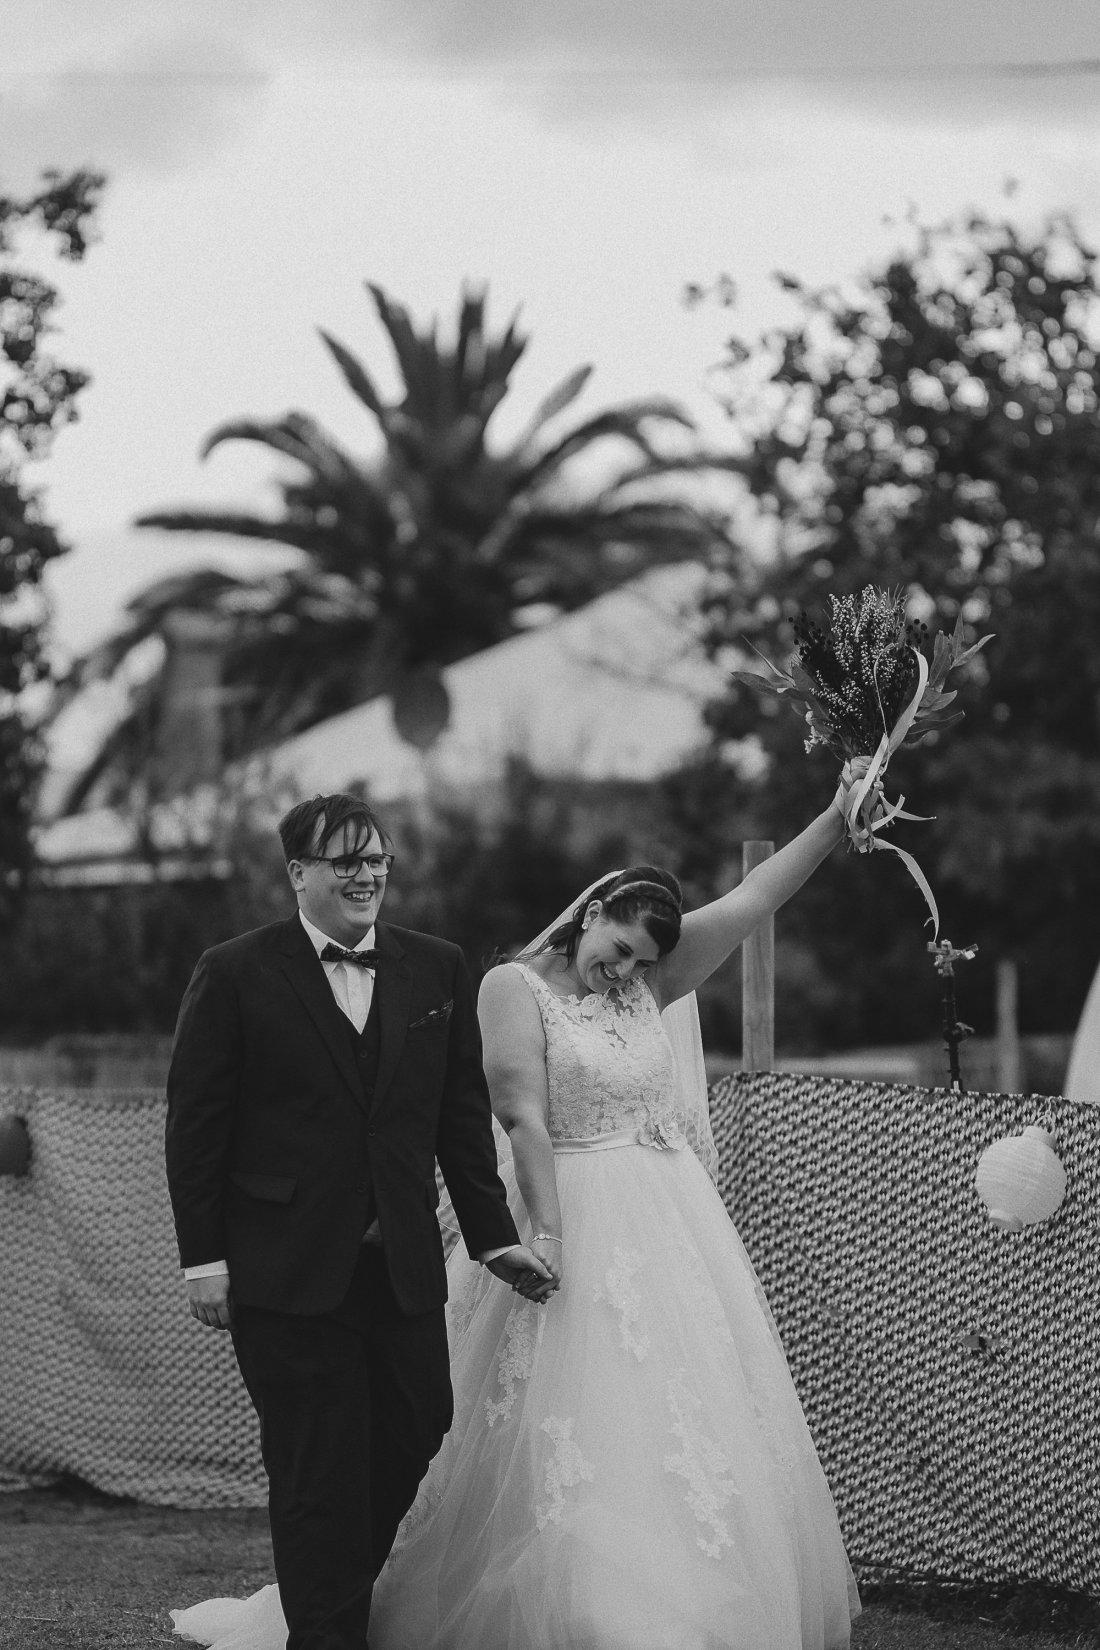 Perth Wedding Photographer   Wedding Photographers Perth   Bells Rapids Wedding   Zoe Theaidore Photography   Ebony Blush Photography   M+K673